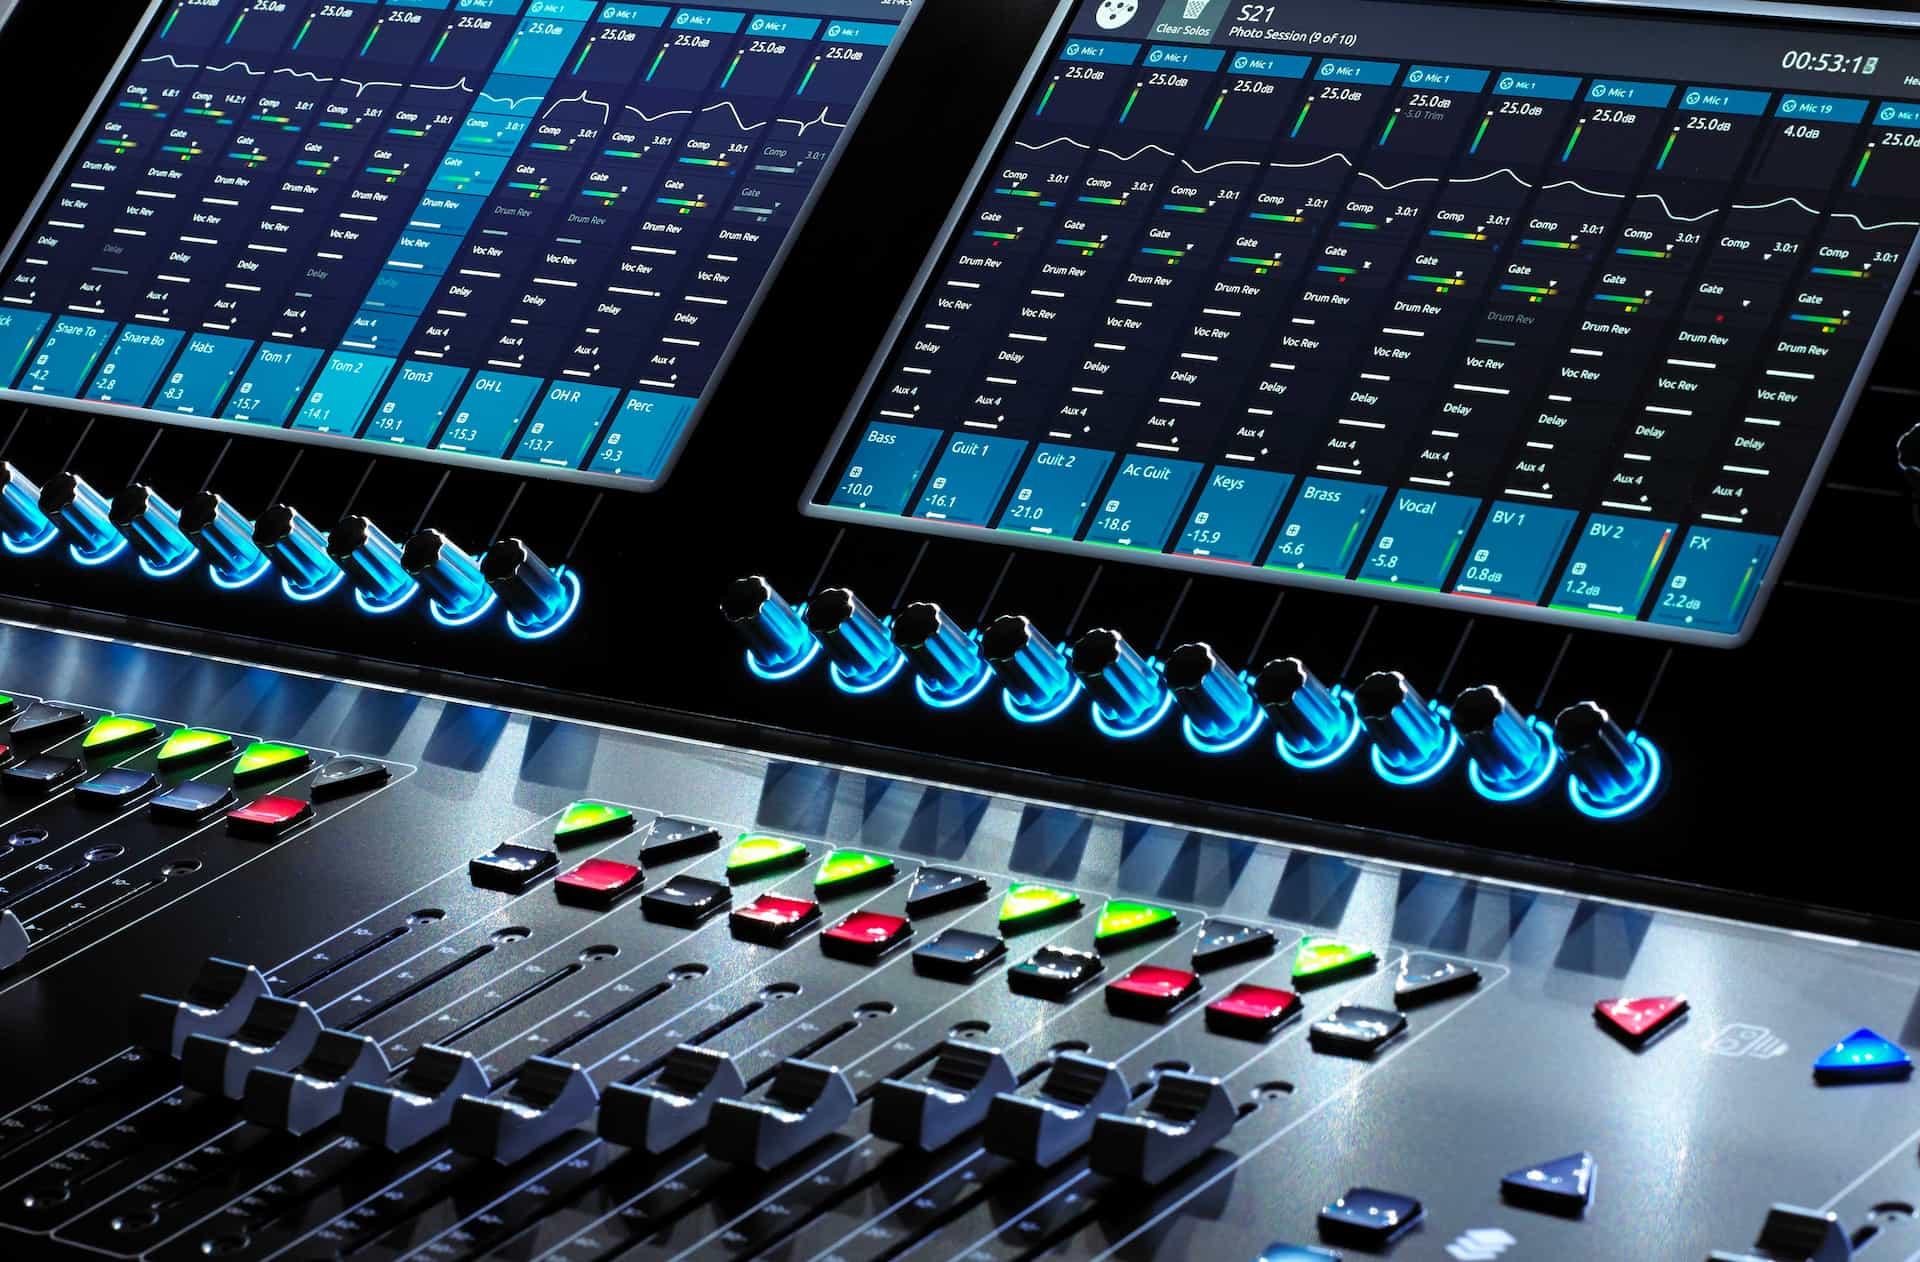 AV Sound Desk at a Live Event